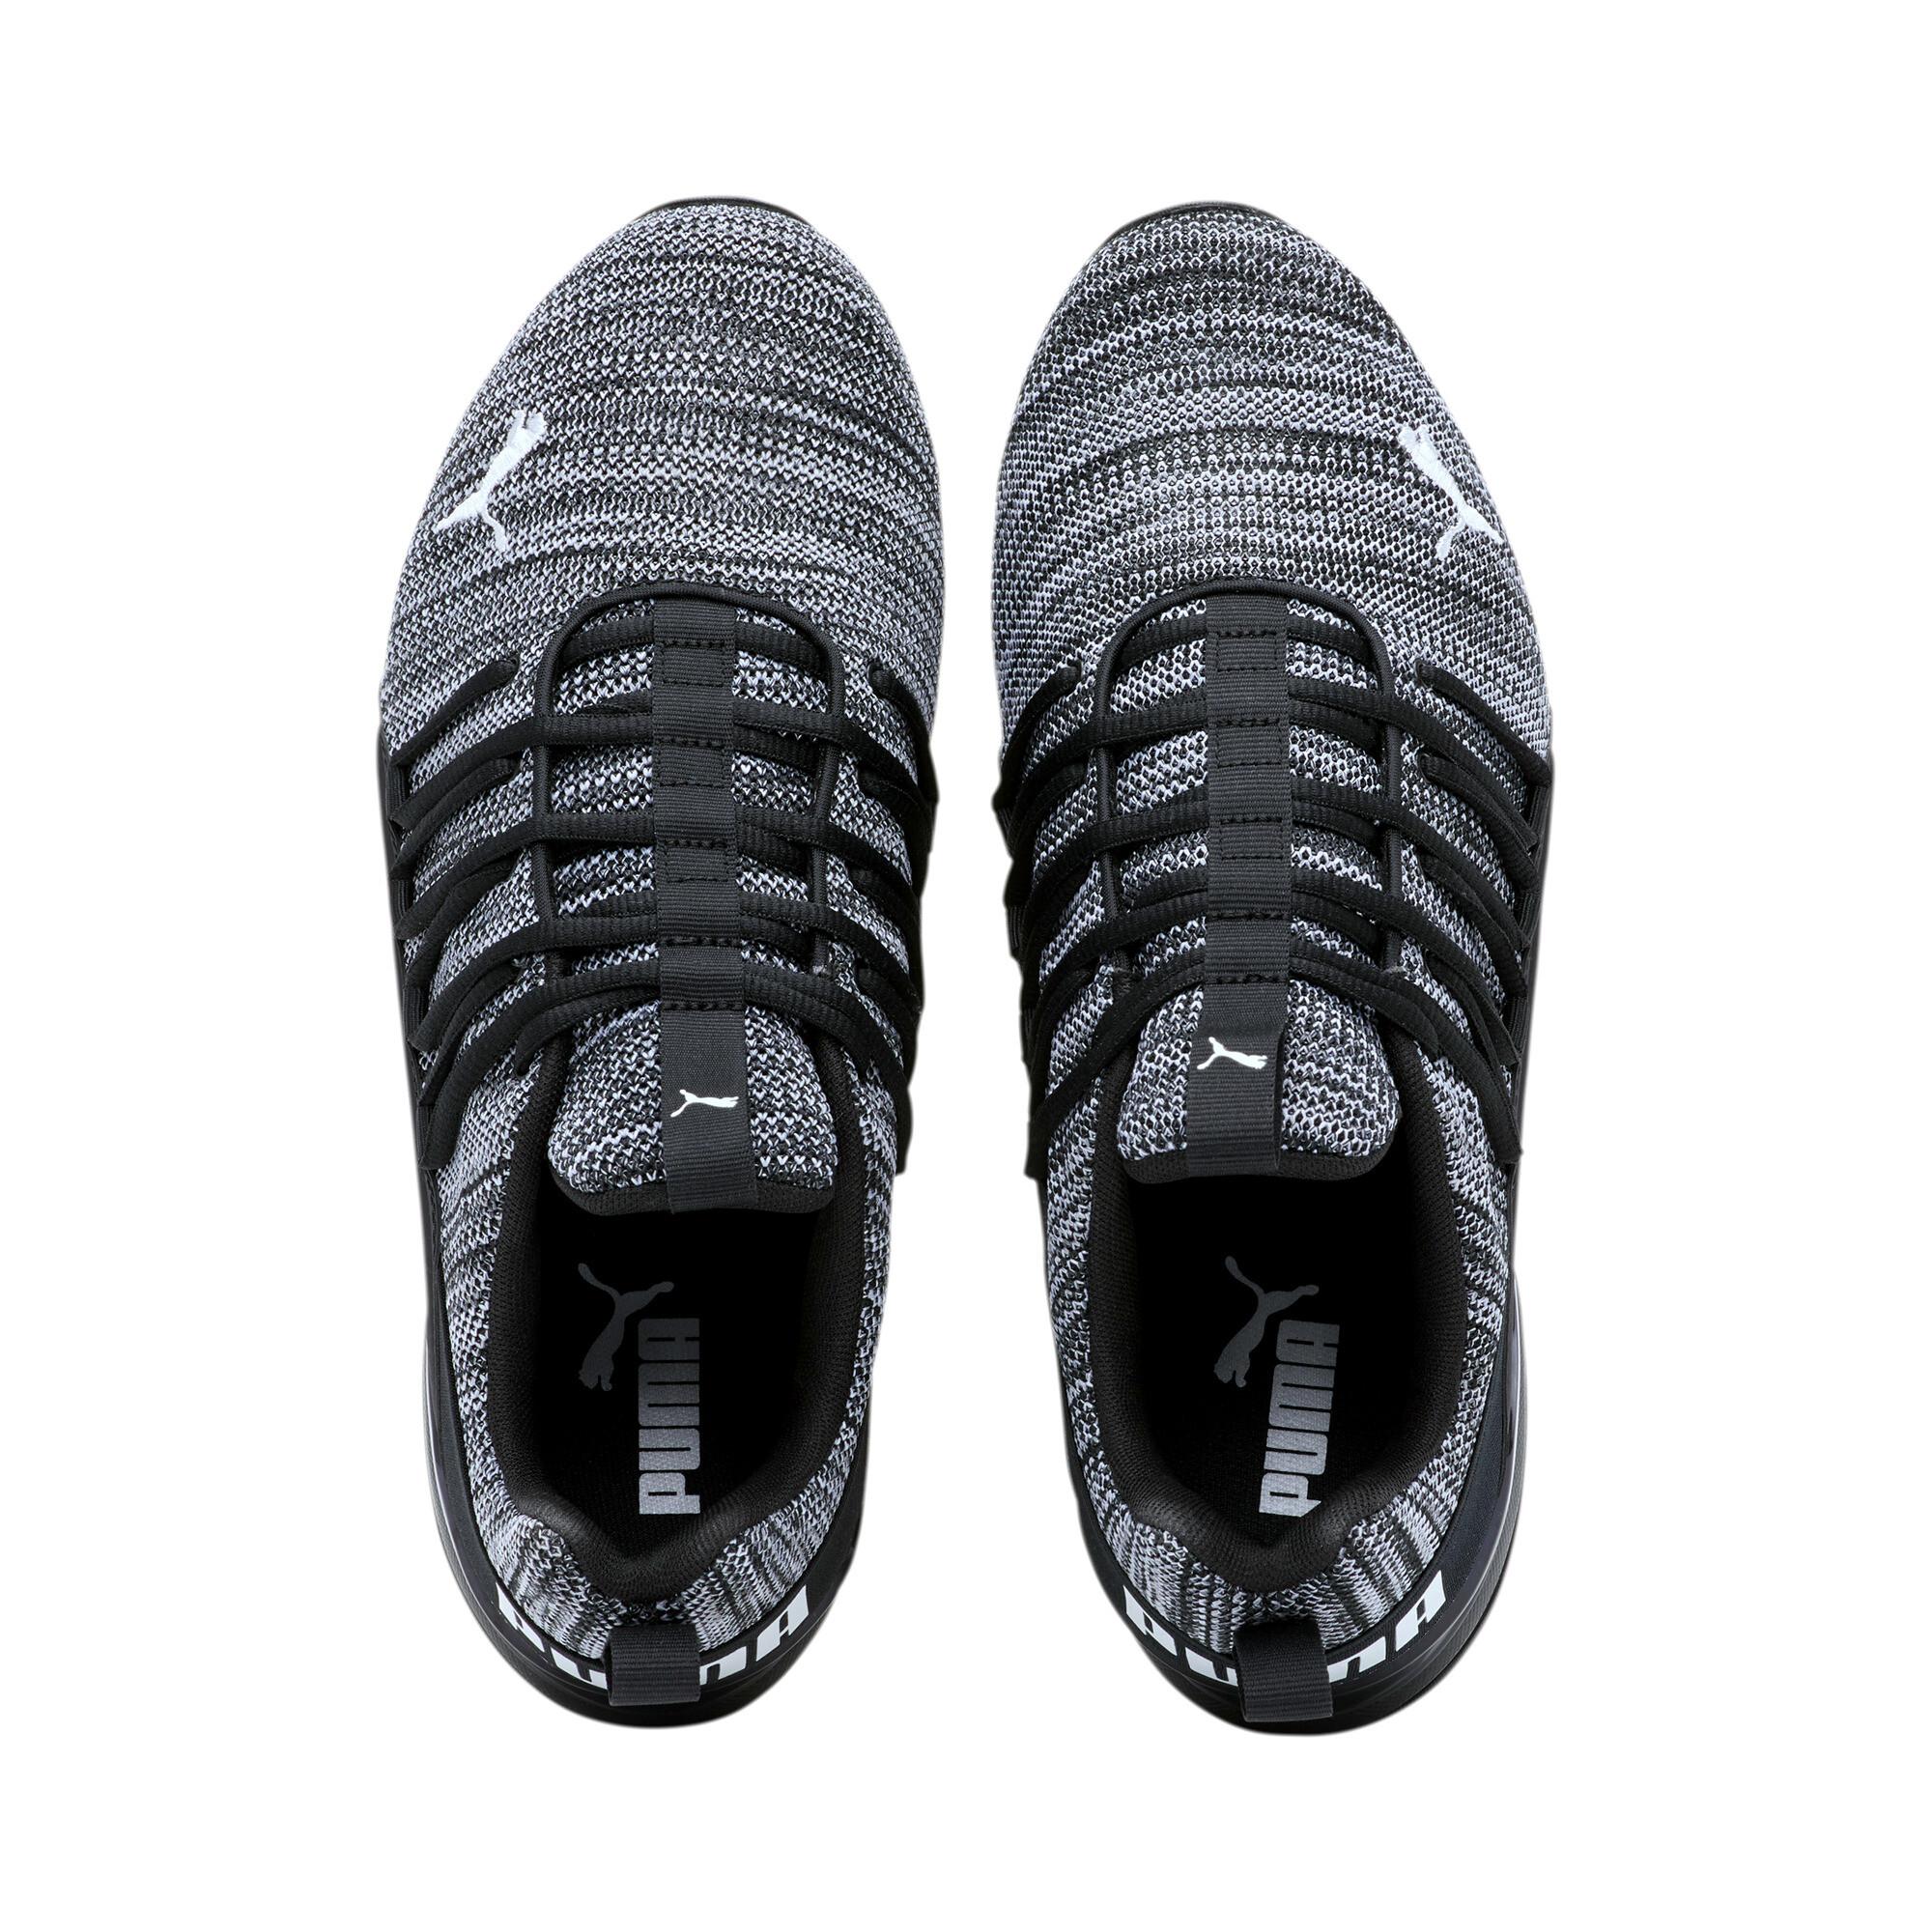 PUMA-Men-039-s-Momenta-Wide-Training-Shoes thumbnail 7